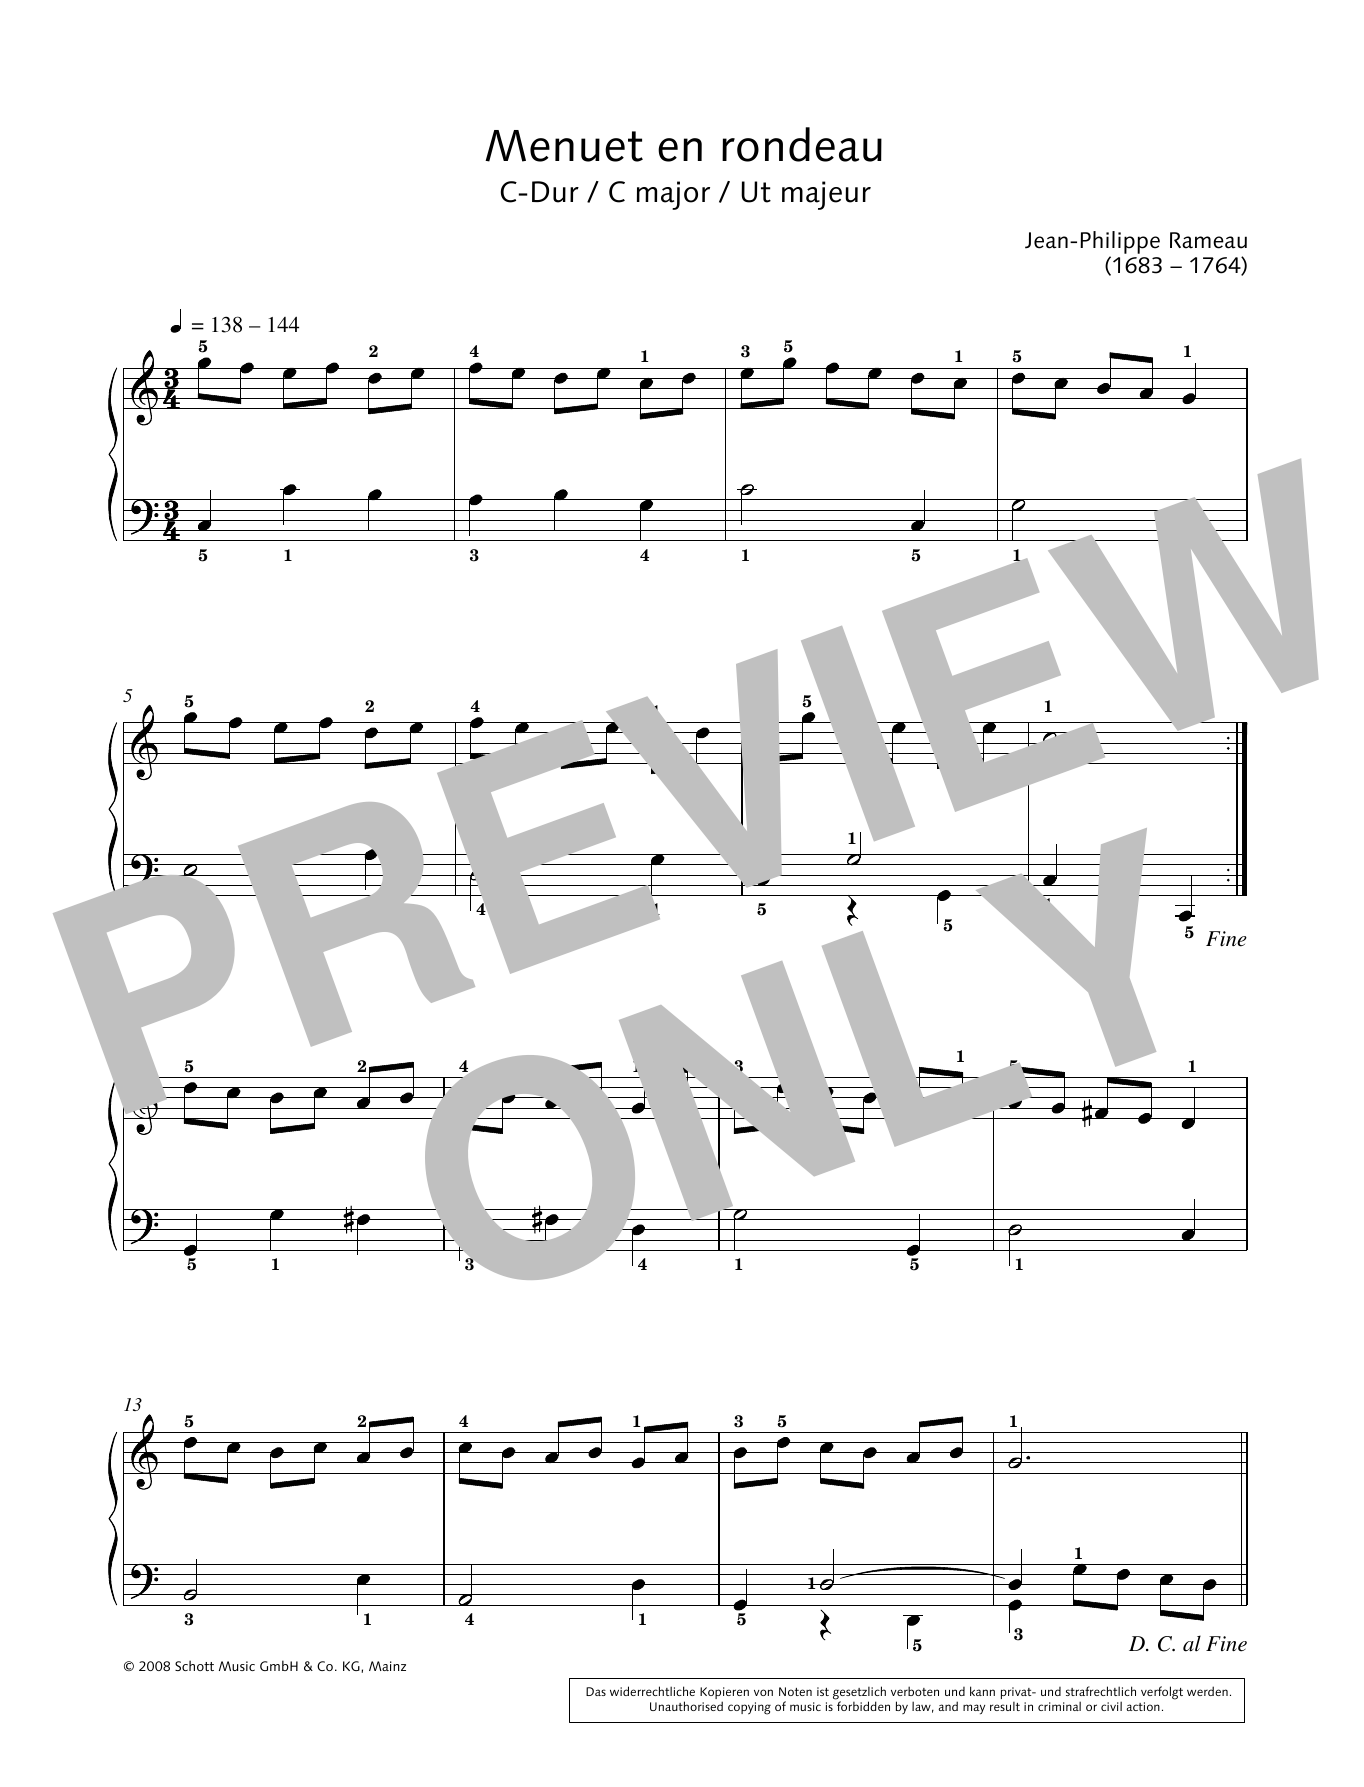 Menuet en rondeau in C major Sheet Music